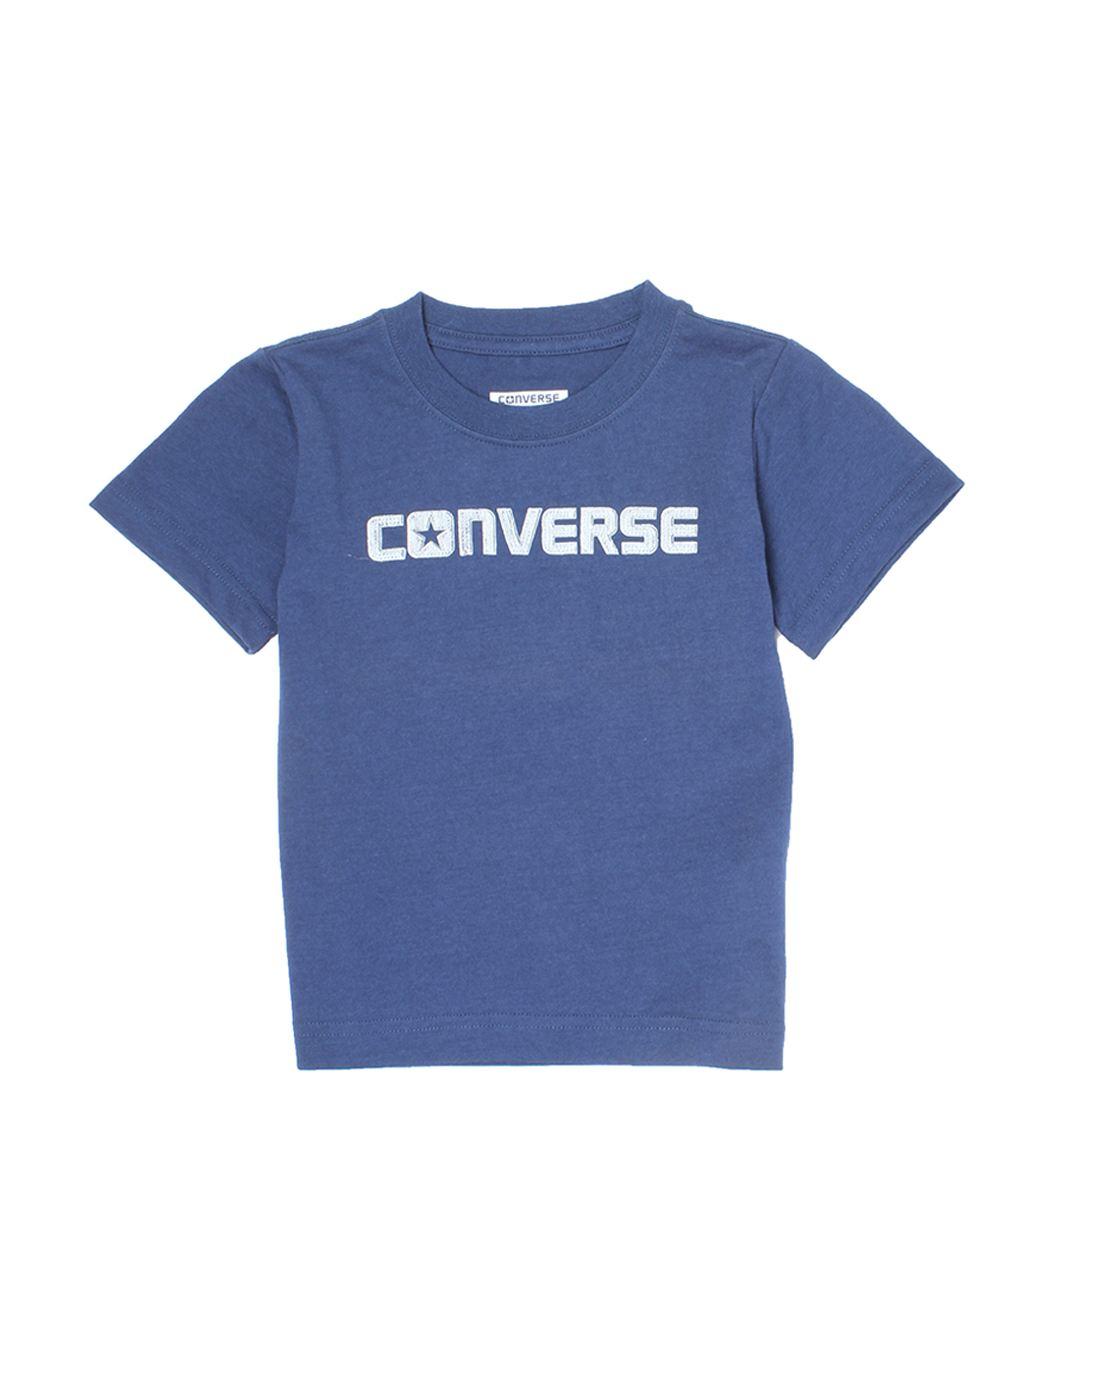 Converse Boys Blue T-Shirt